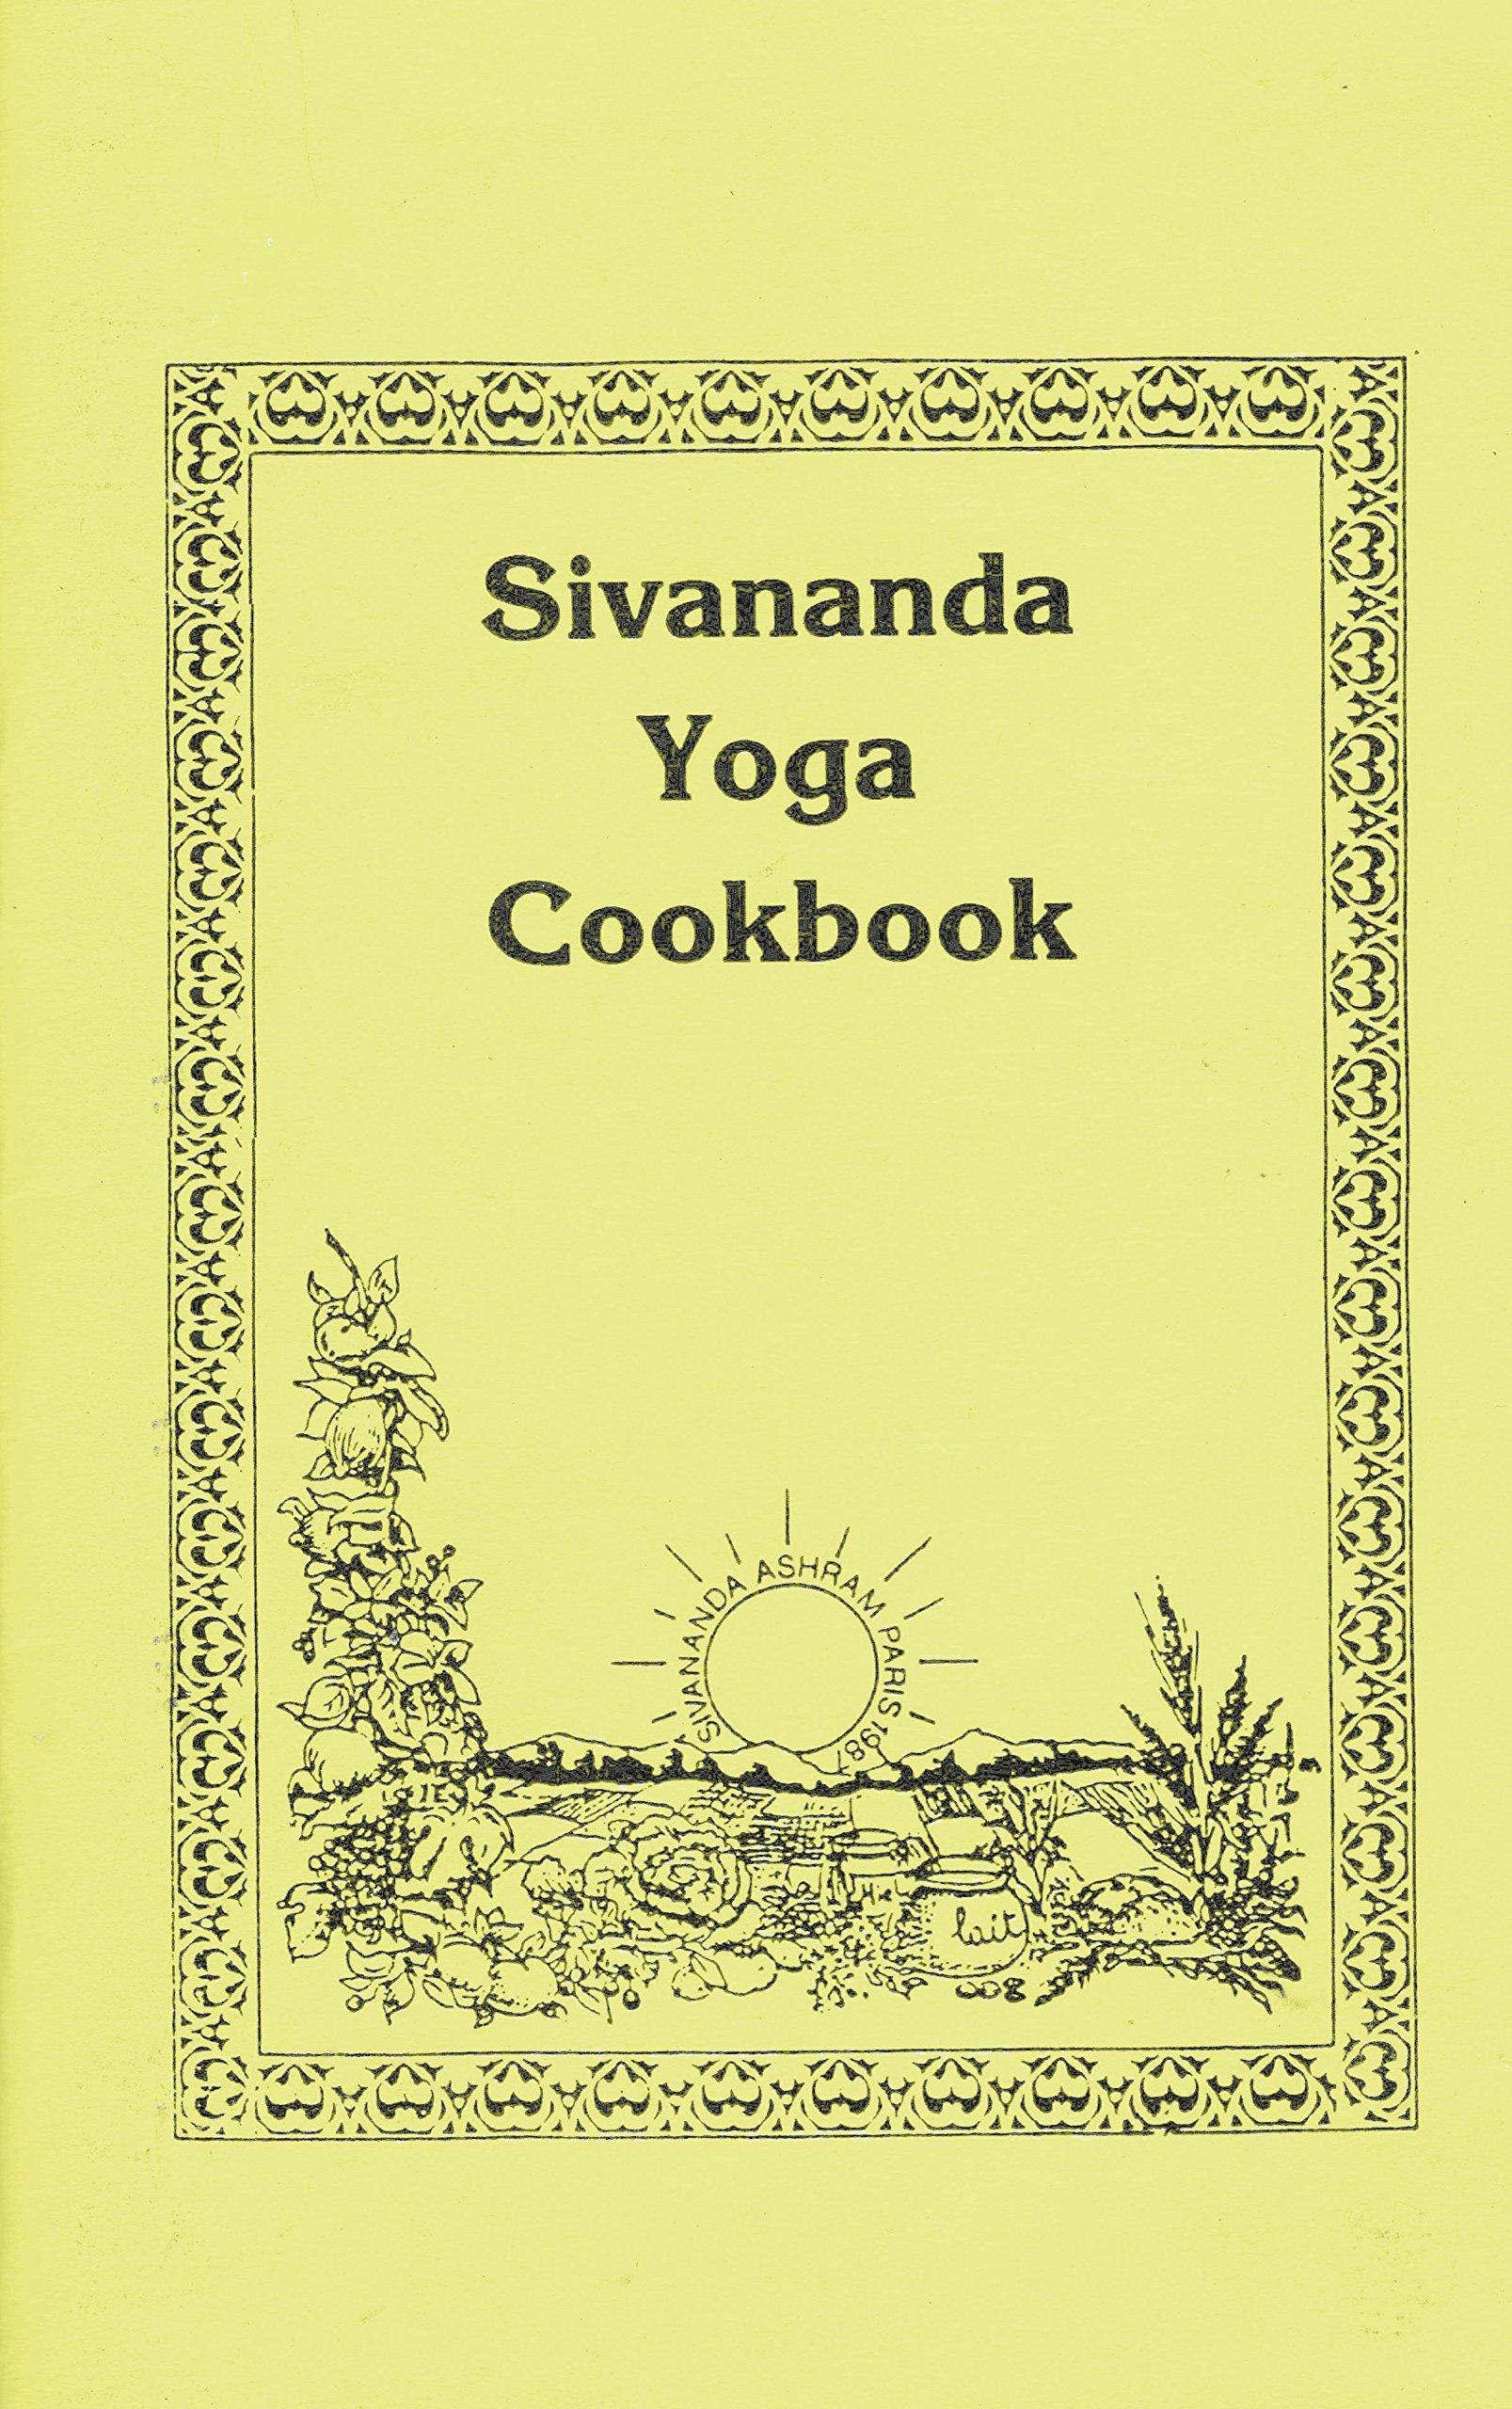 Sivananda Yoga Cookbook: Uma, Angelo Elefante: Amazon.com: Books